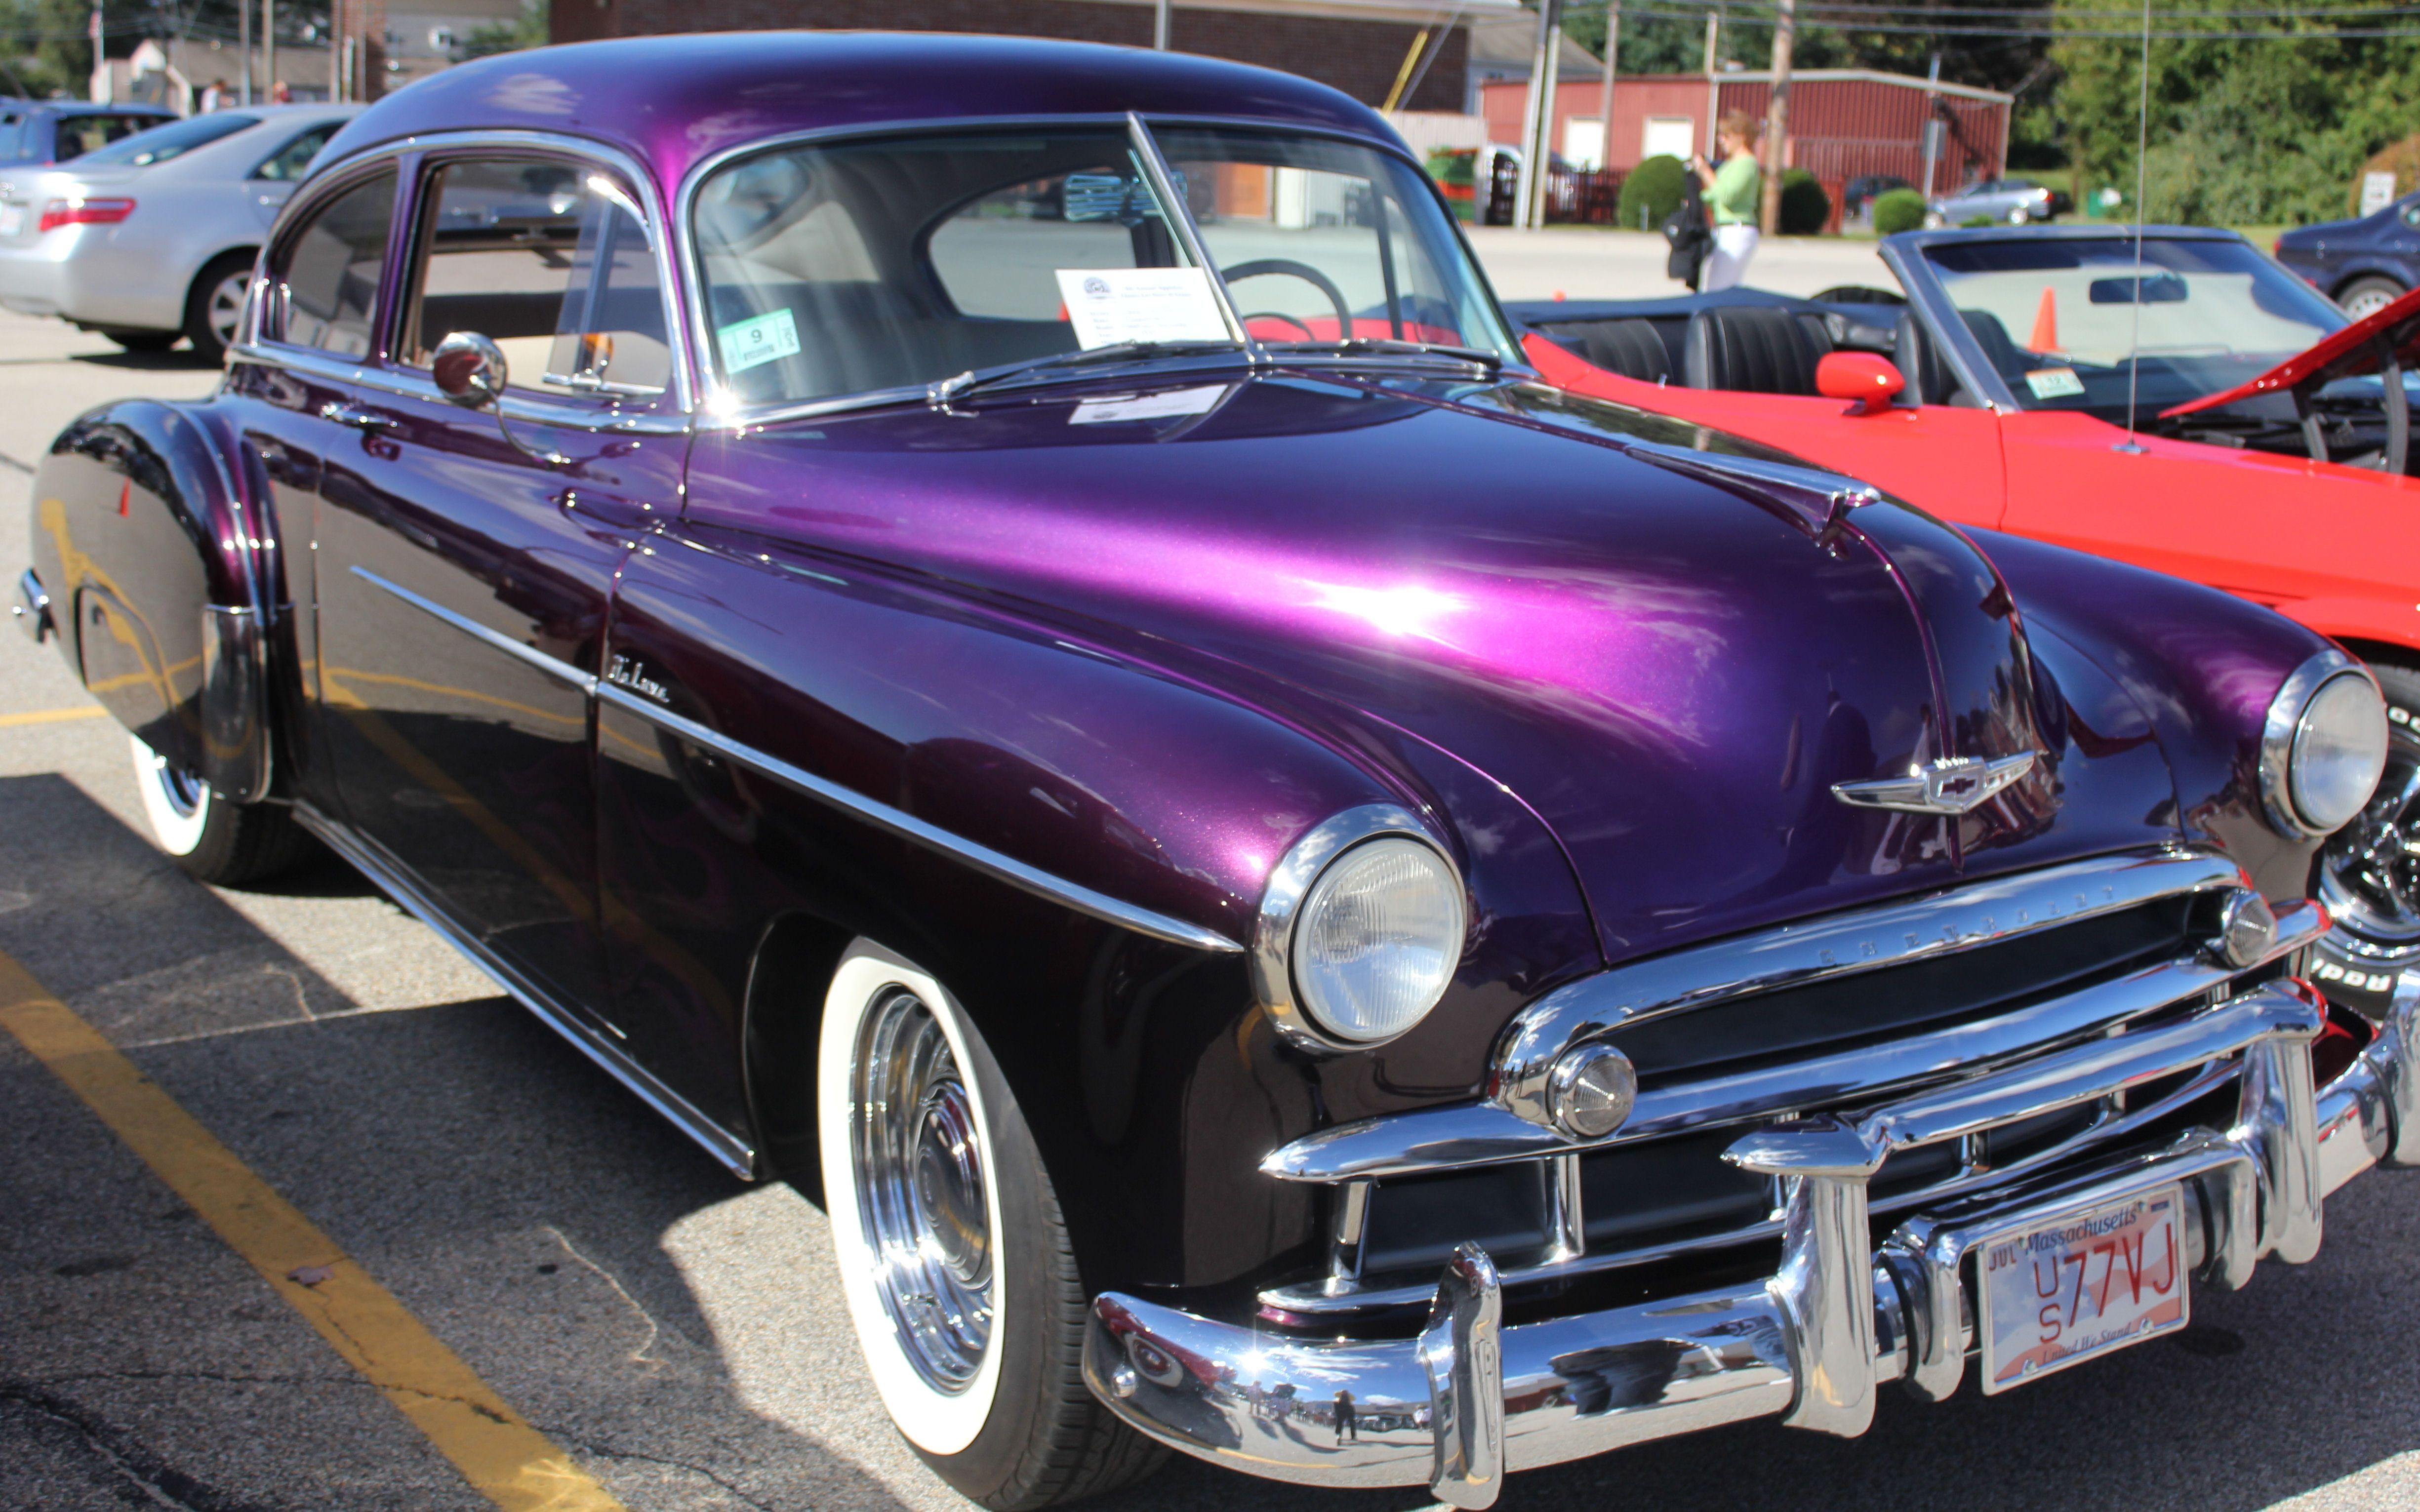 classic show cars - Google Search | custom autos | Pinterest ...